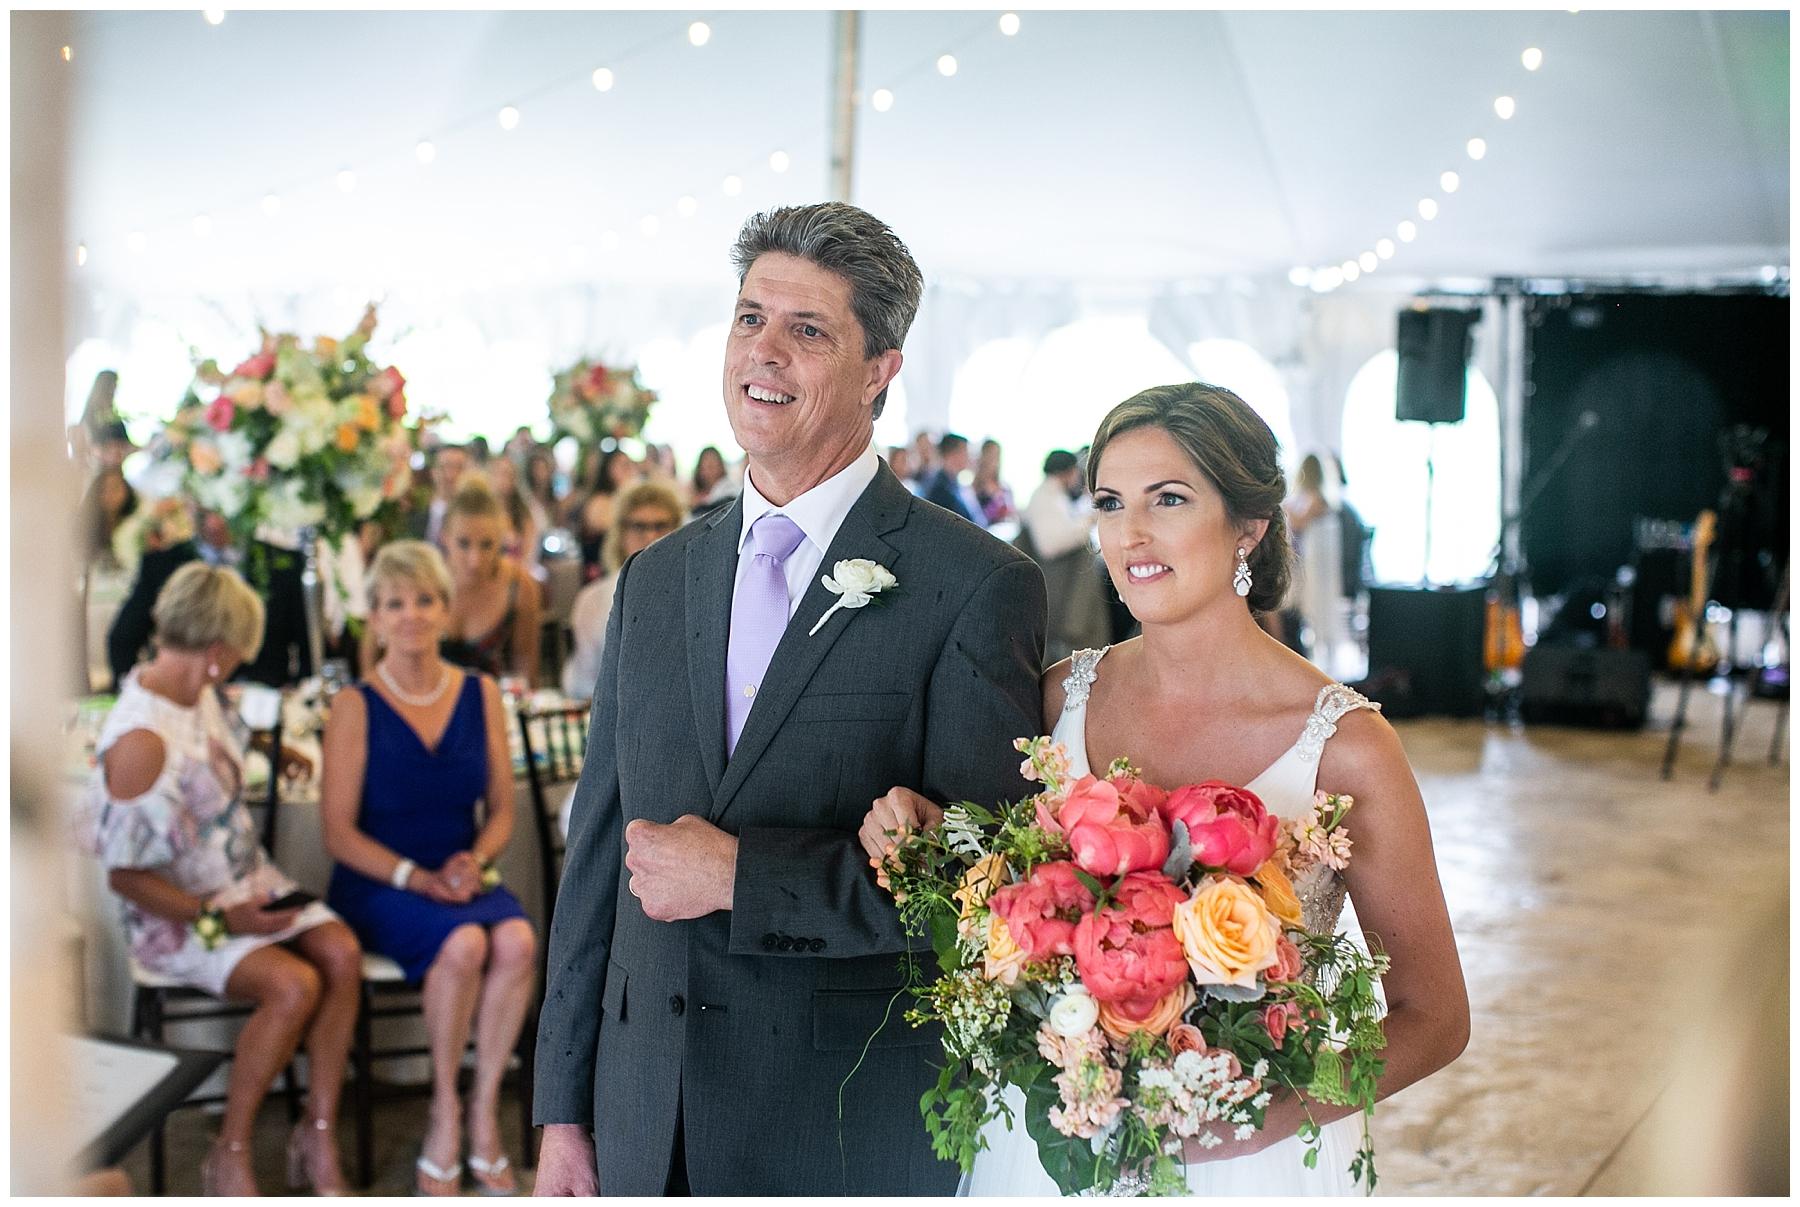 Chelsea Phil Bohemia River Overlook Wedding Living Radiant Photography photos_0106.jpg